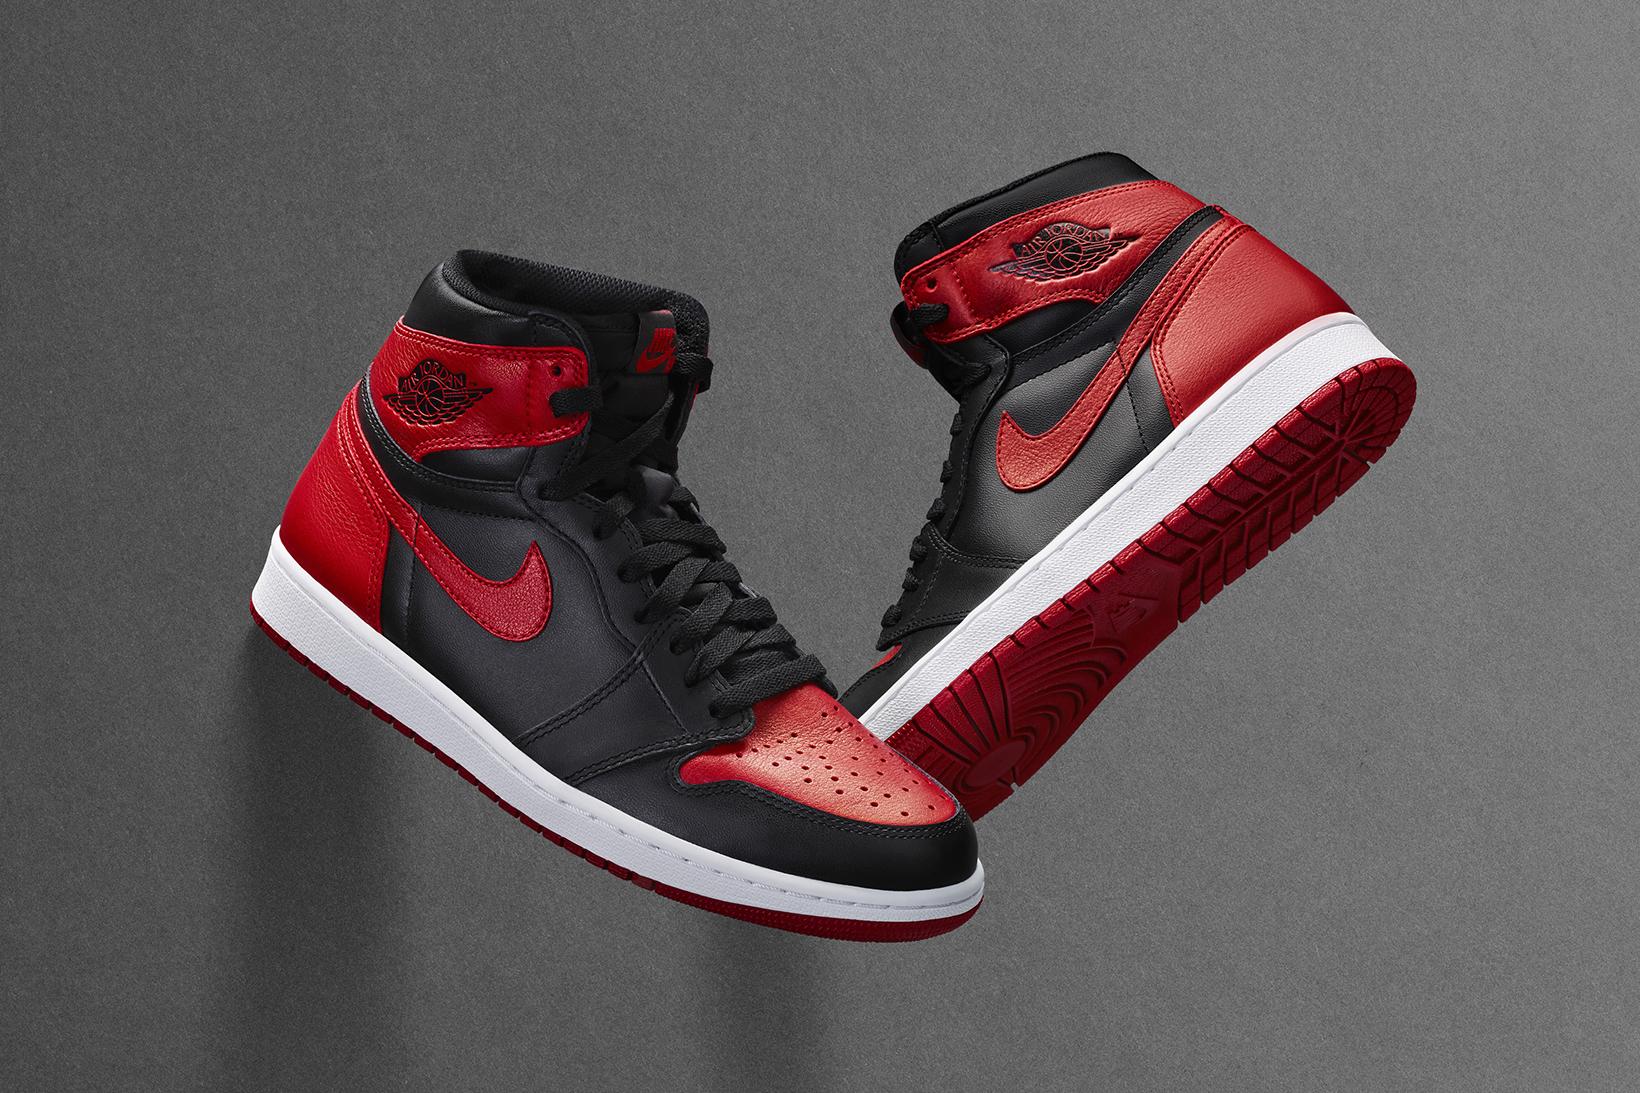 High Cut Air Jordan 1 I Retro Mens Shoes White Black Red